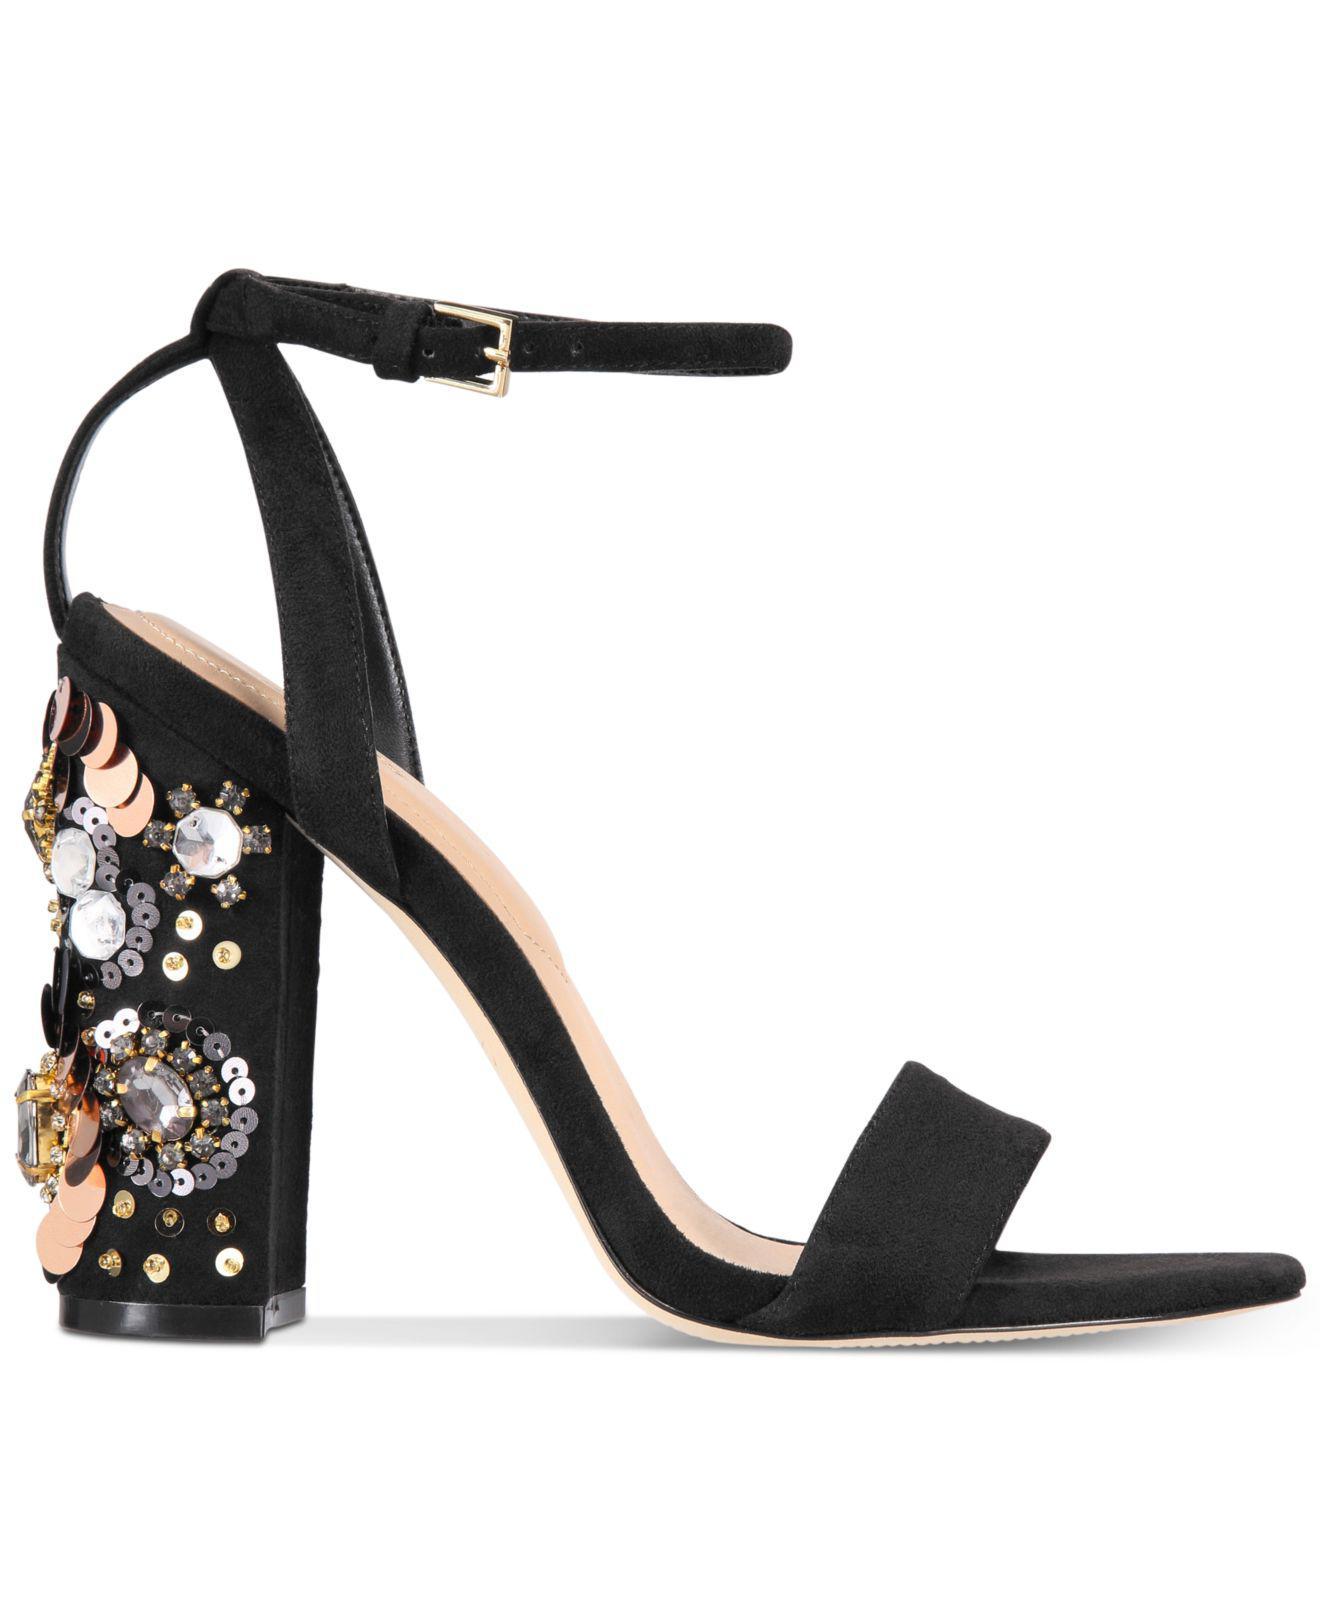 c123d943fc8 Lyst - ALDO Luciaa Two-piece Dress Sandals in Black